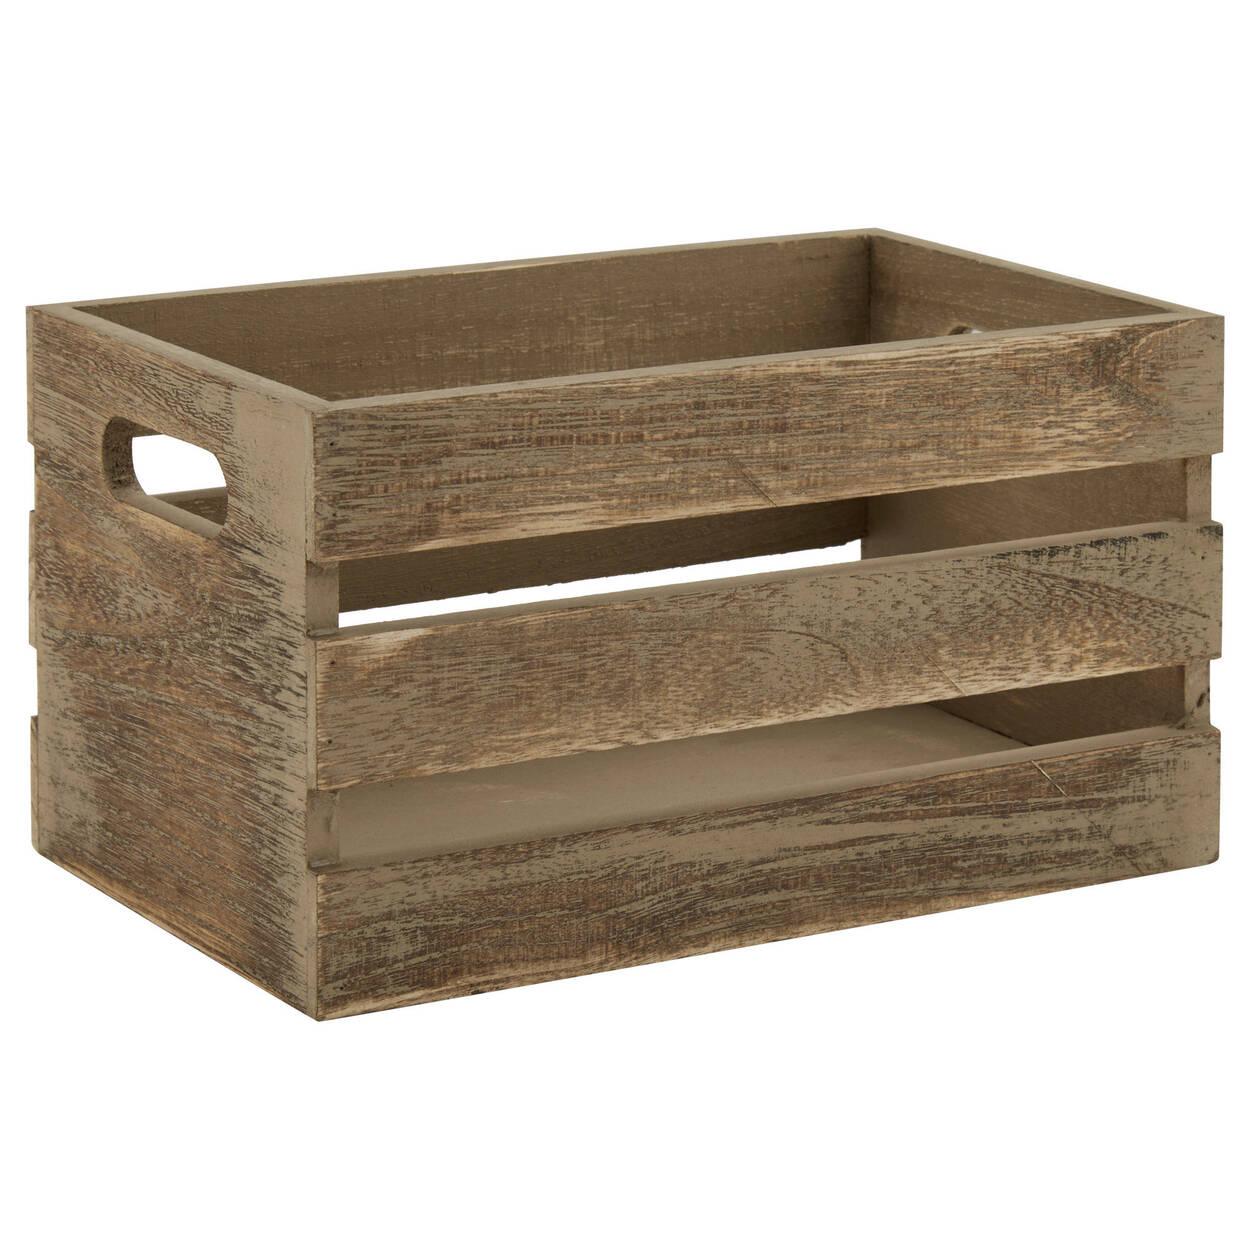 petite caisse en bois. Black Bedroom Furniture Sets. Home Design Ideas